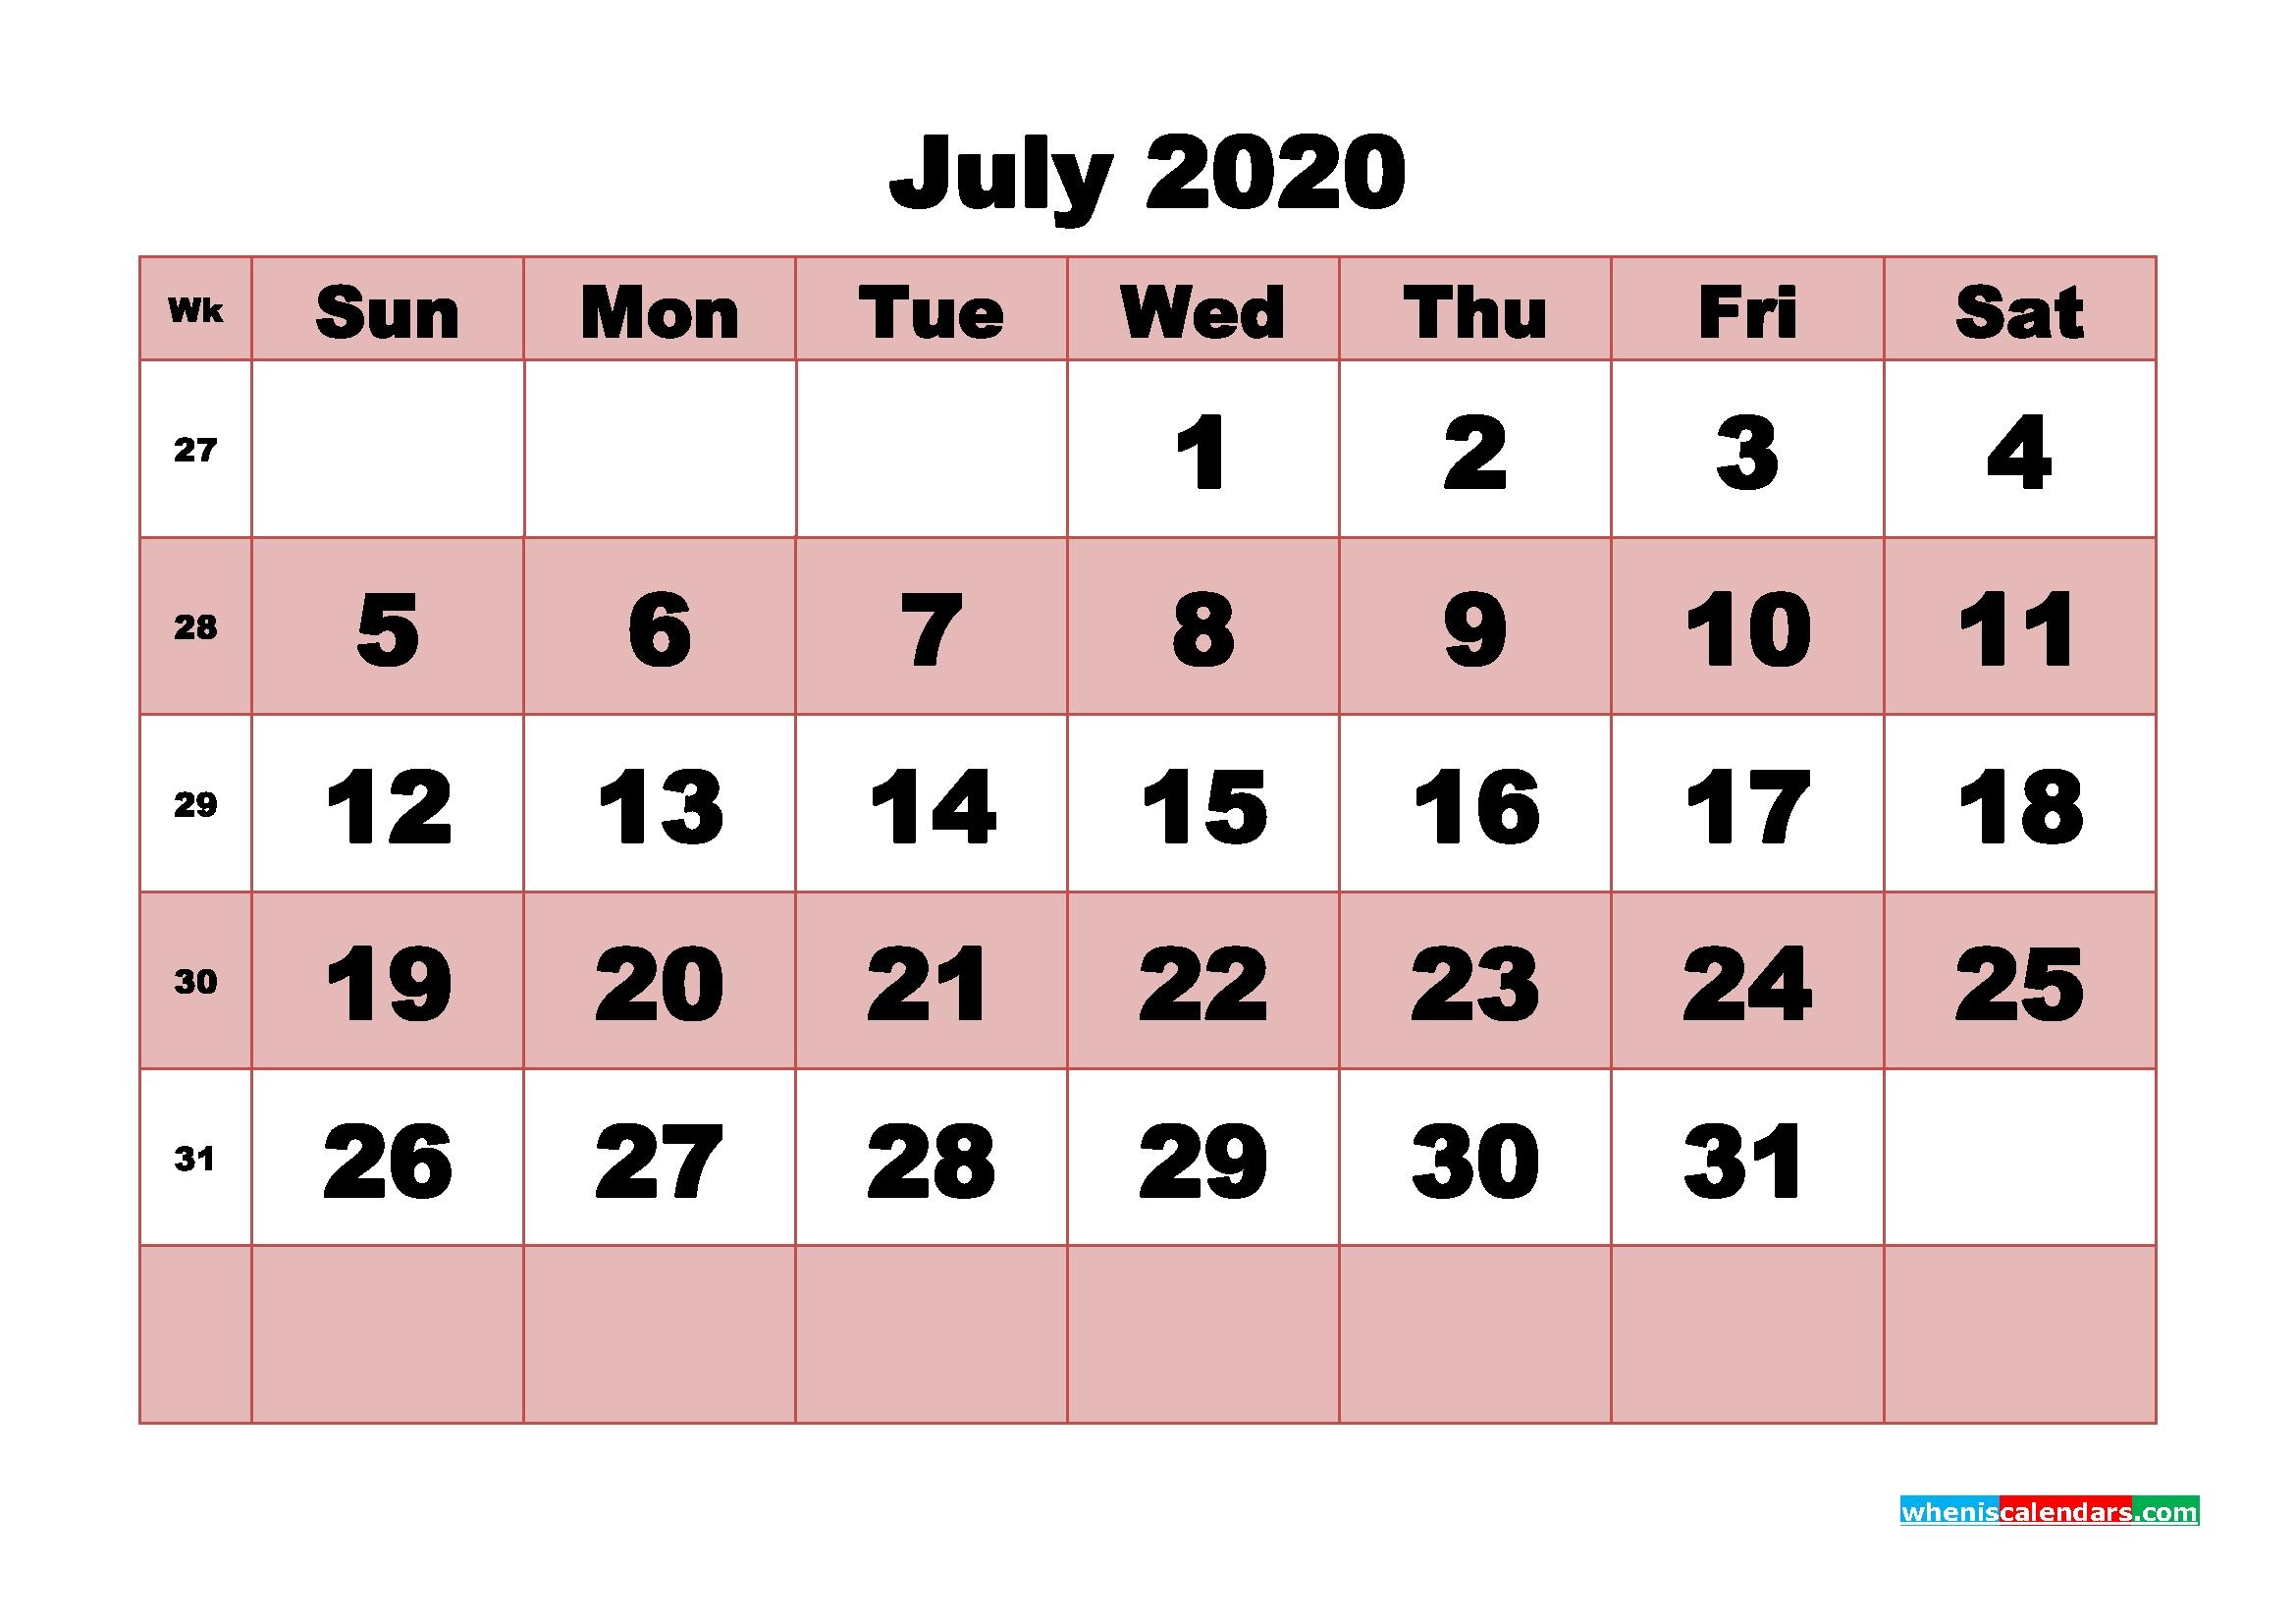 Blank Calendar 2020 July Printable Word, Pdf, Png - Free Printable 2020 Monthly Calendar With